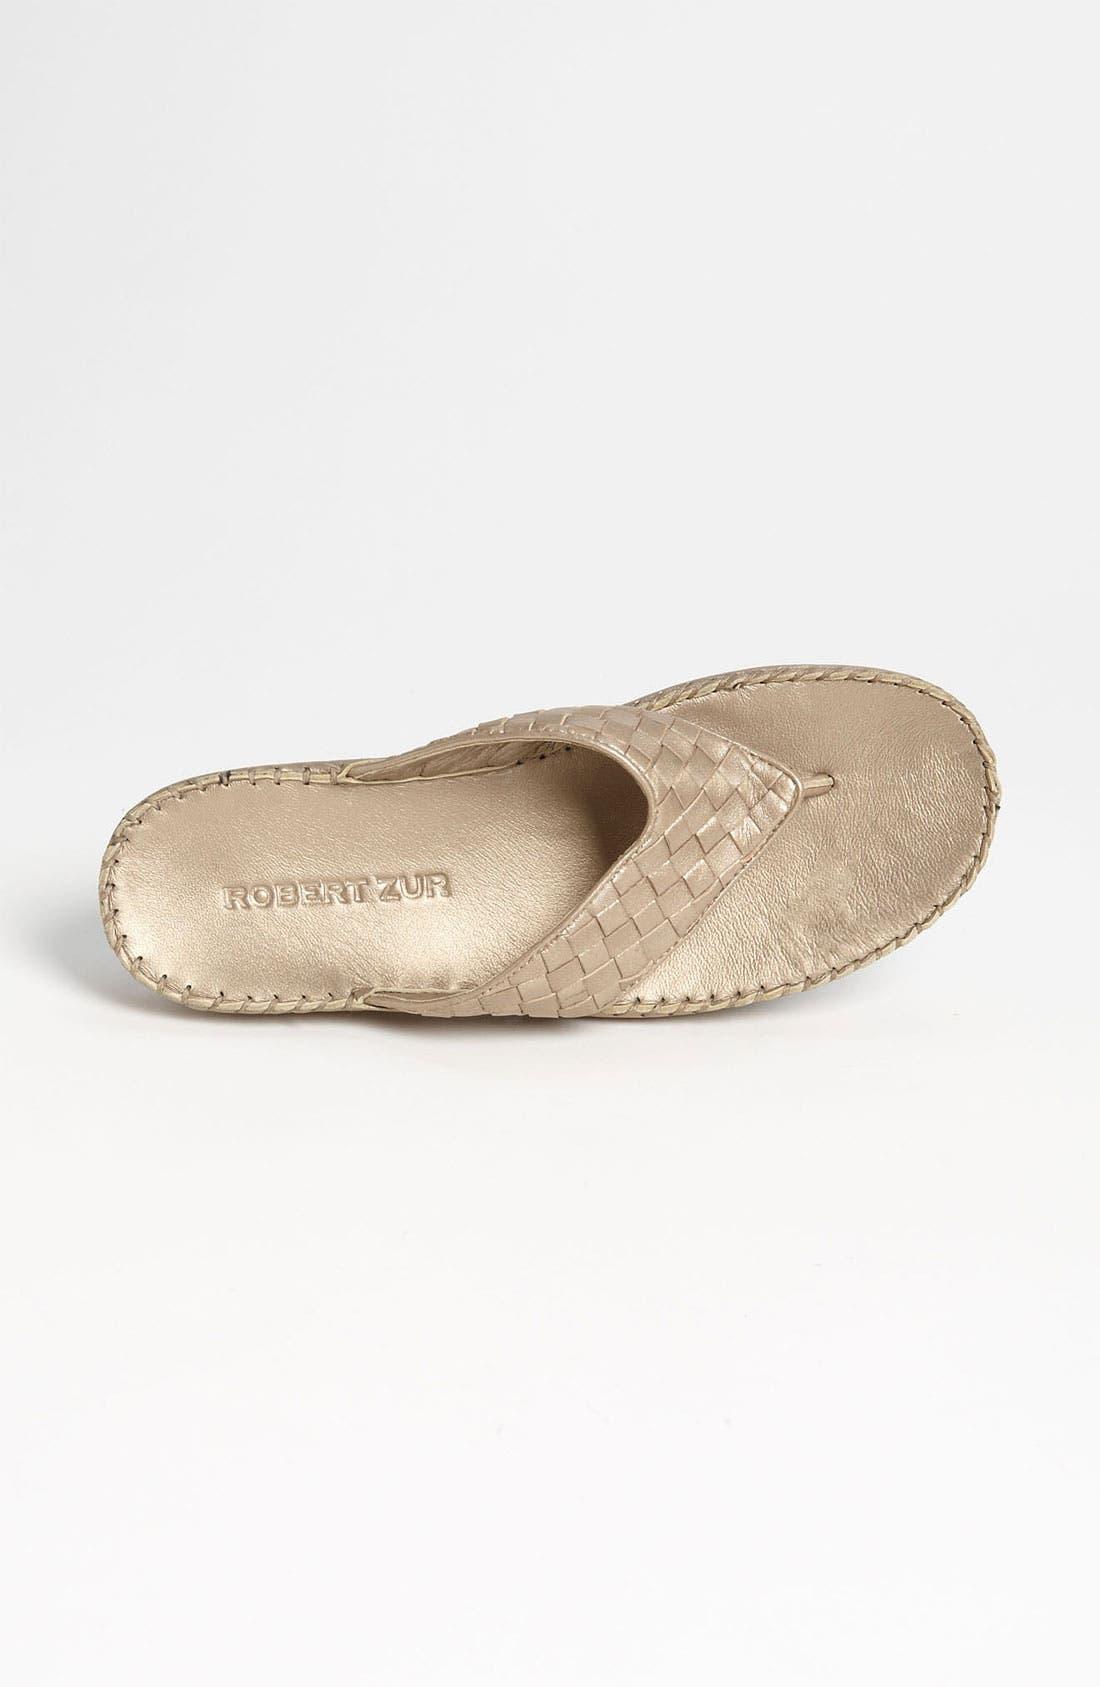 Alternate Image 3  - Robert Zur 'Lilli' Sandal